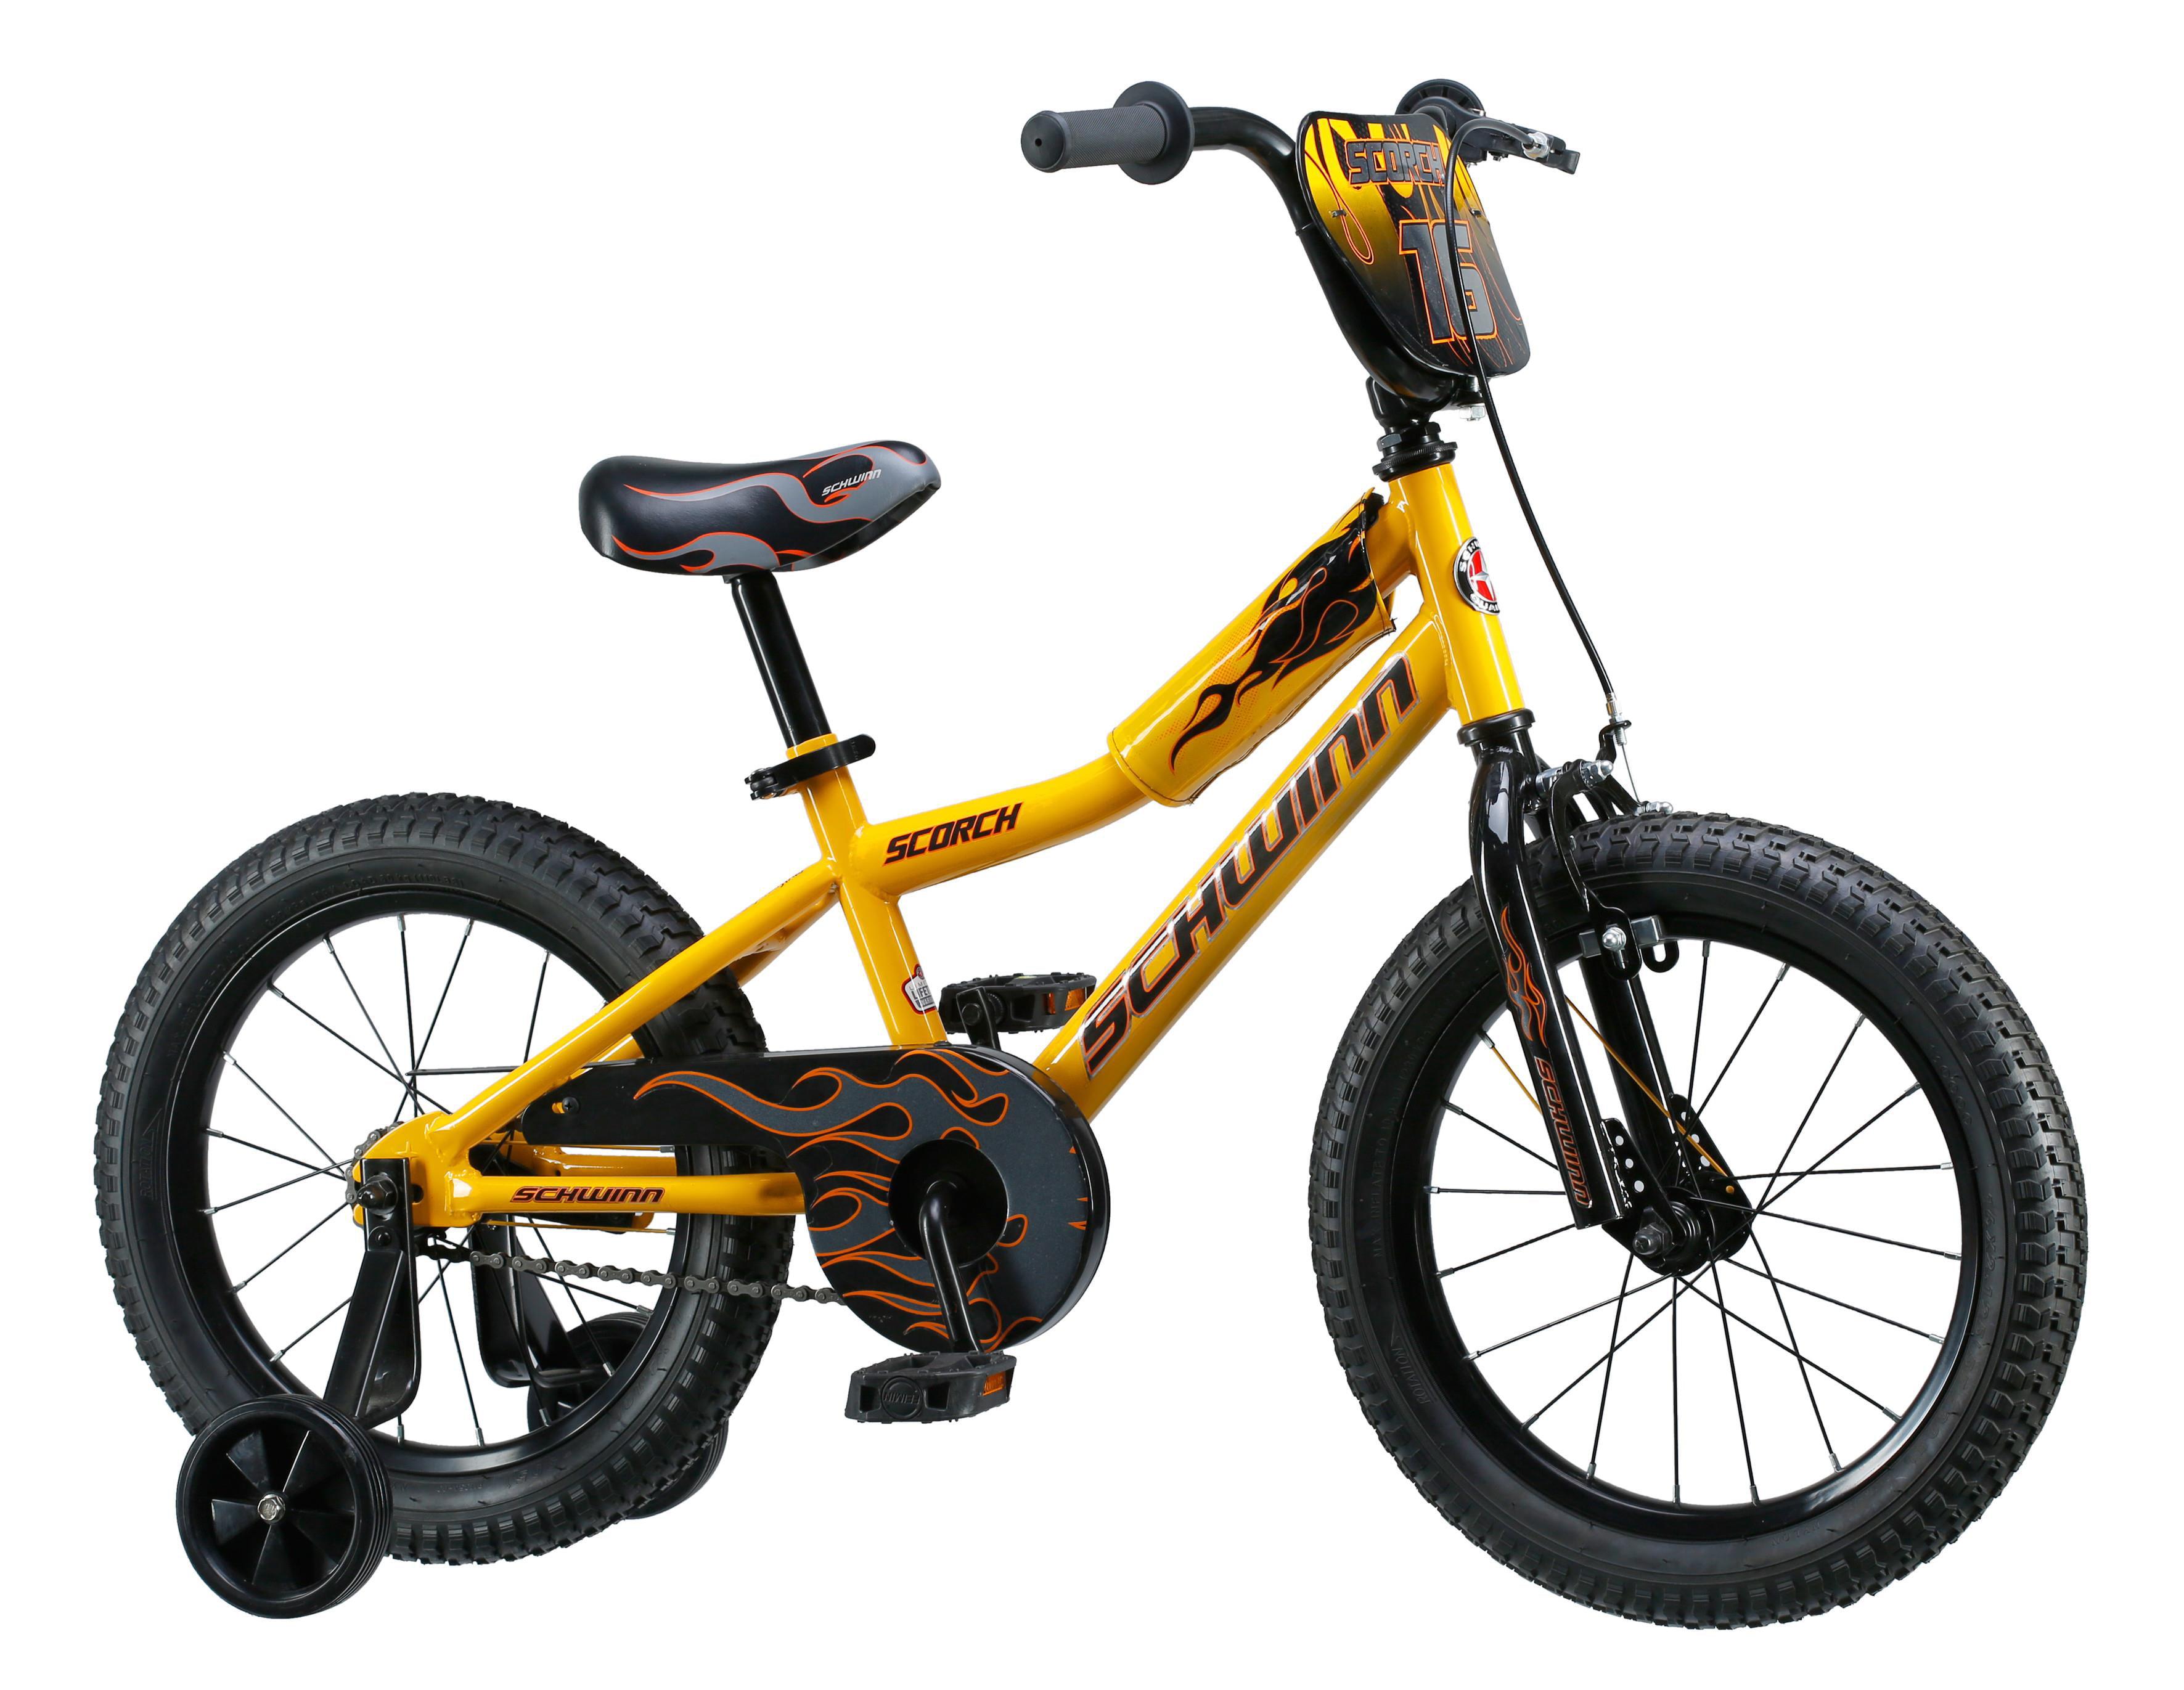 Schwinn Boy's Scorch Bicycle by Schwinn